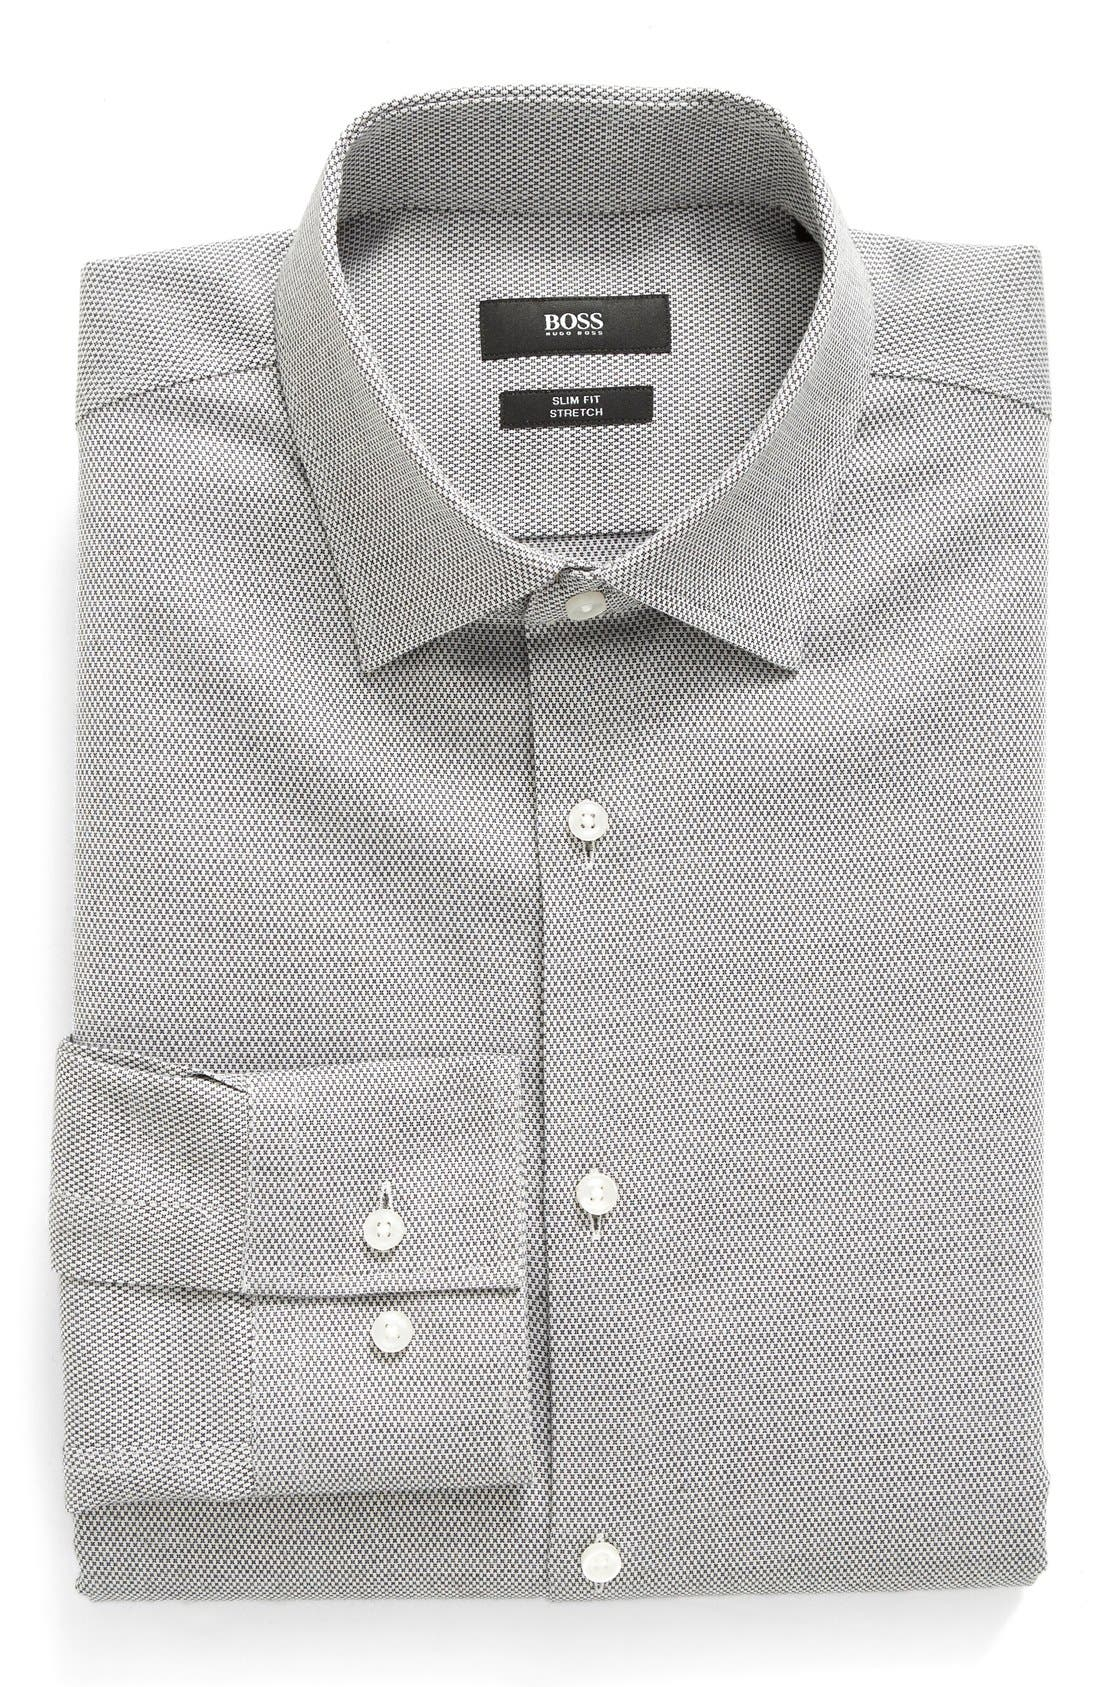 BOSS Slim Fit Solid Stretch Dress Shirt